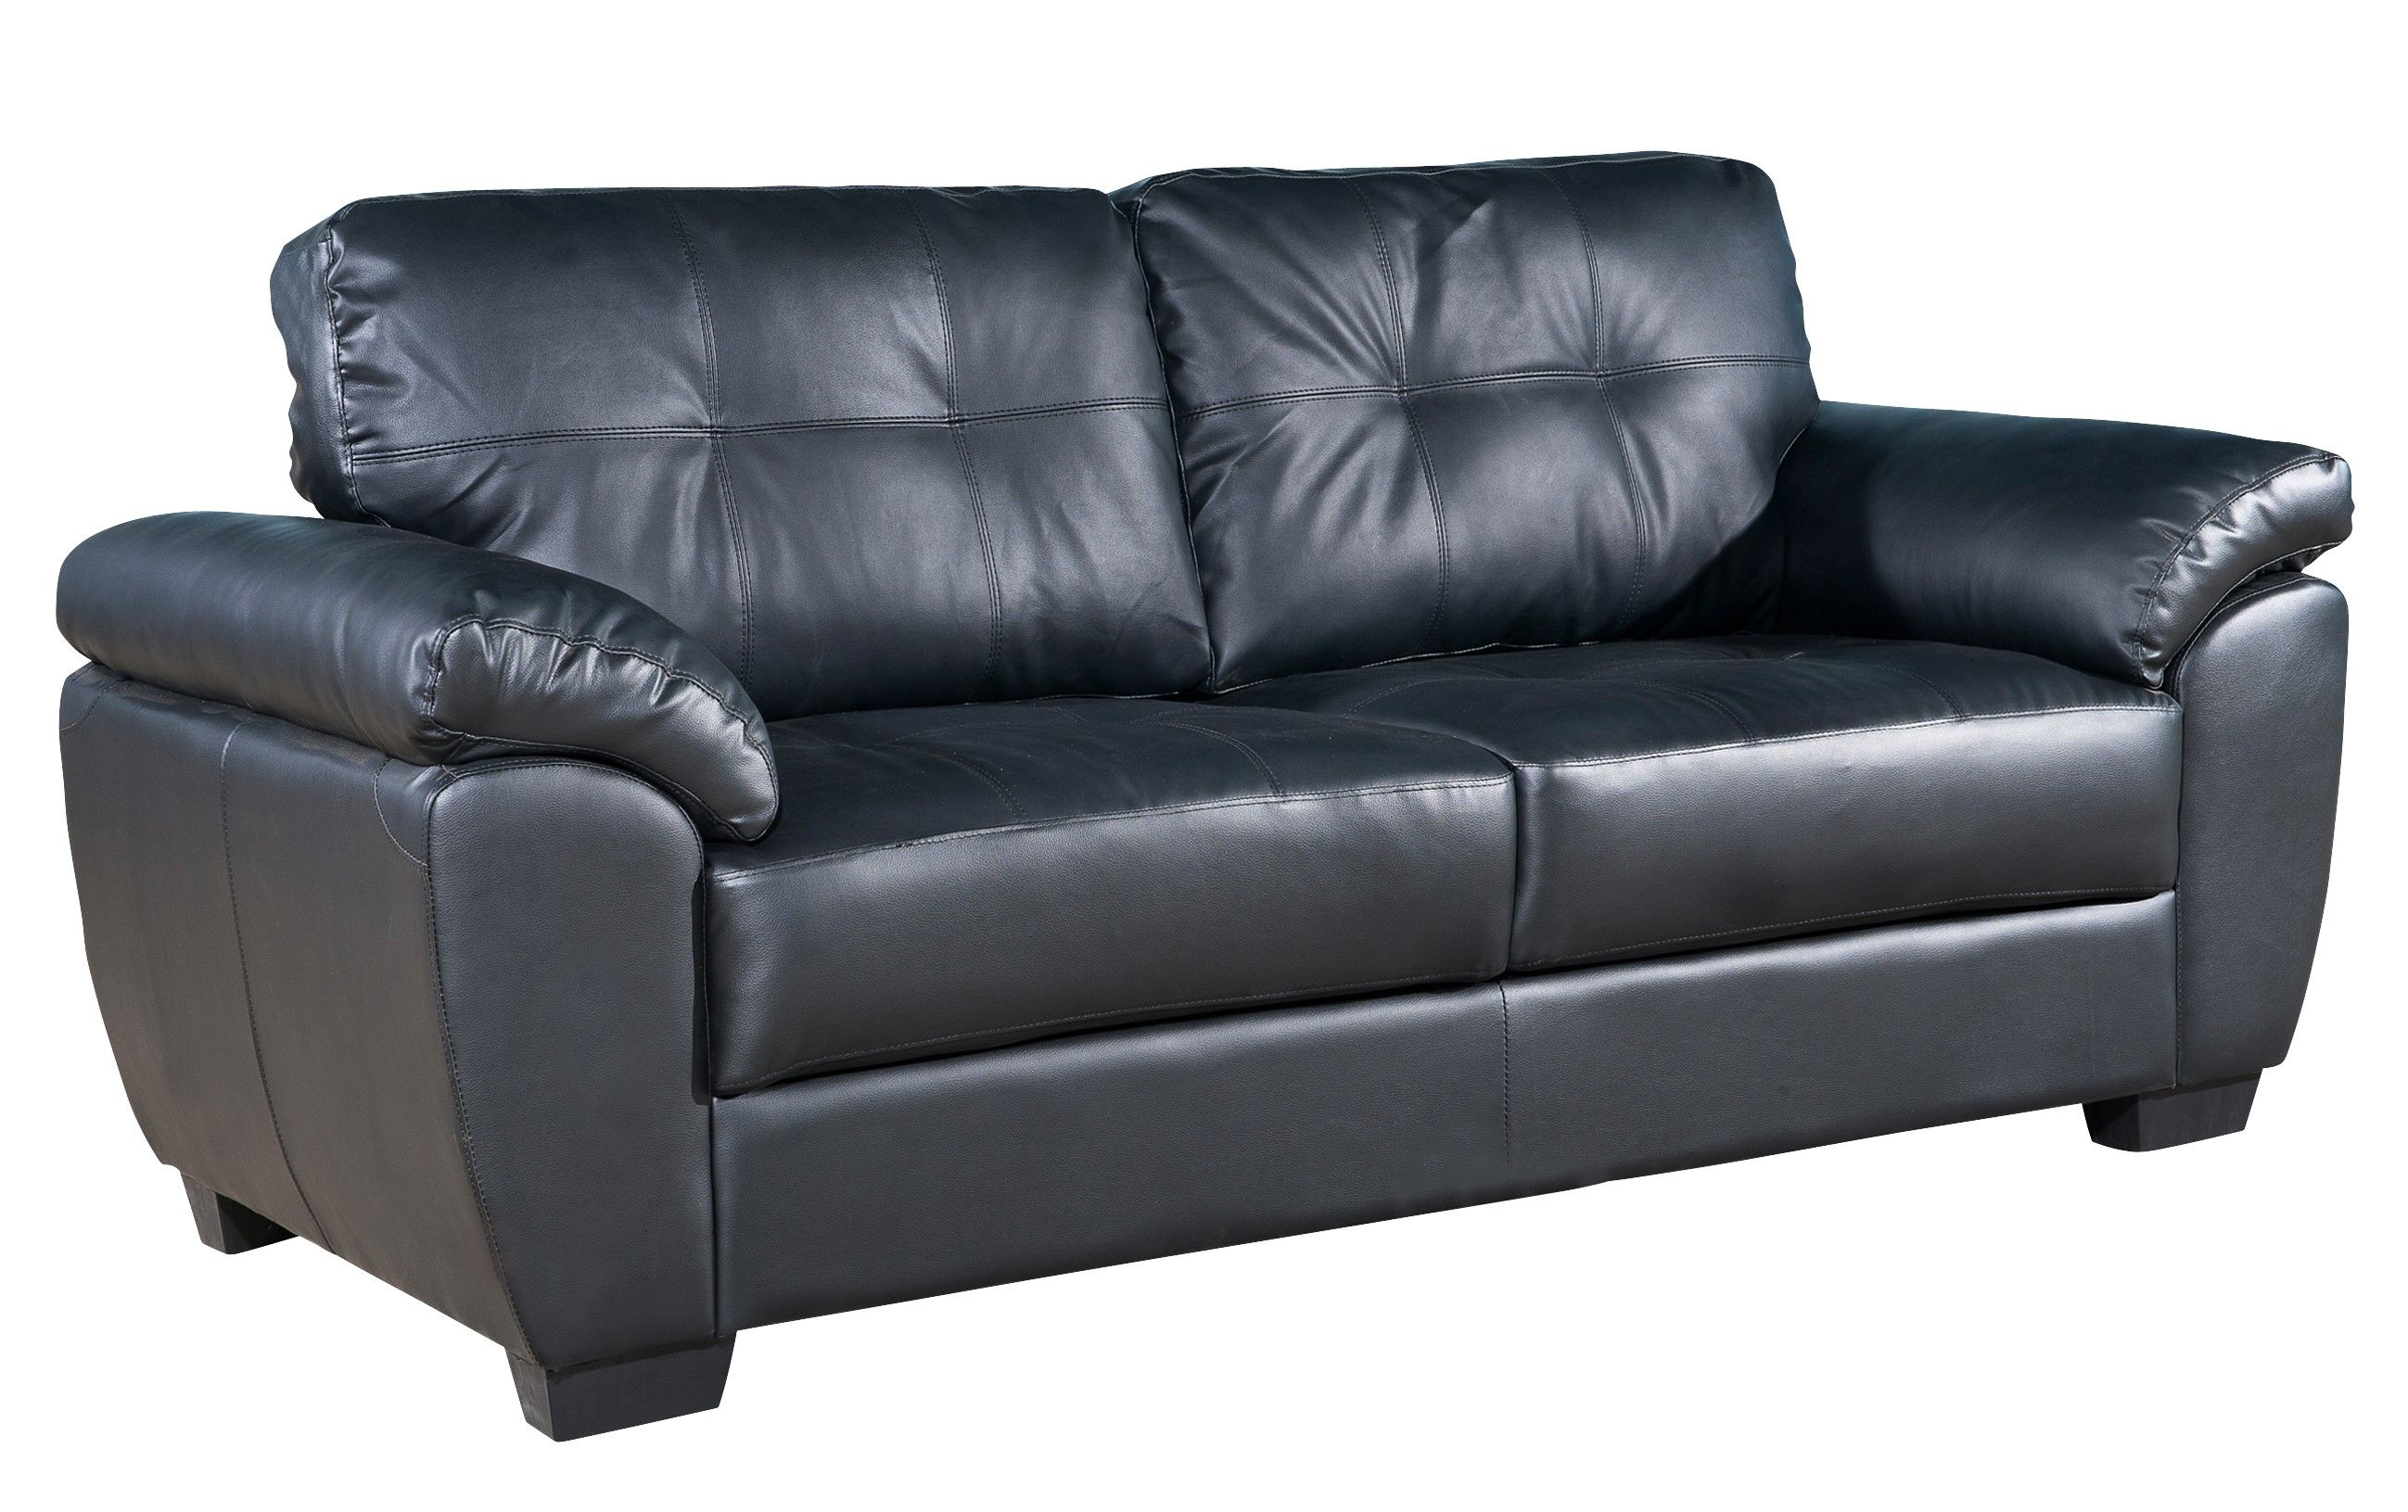 Wondrous Brisbane Premium Bonded Leather 3 Seater Sofa Black 329 Andrewgaddart Wooden Chair Designs For Living Room Andrewgaddartcom